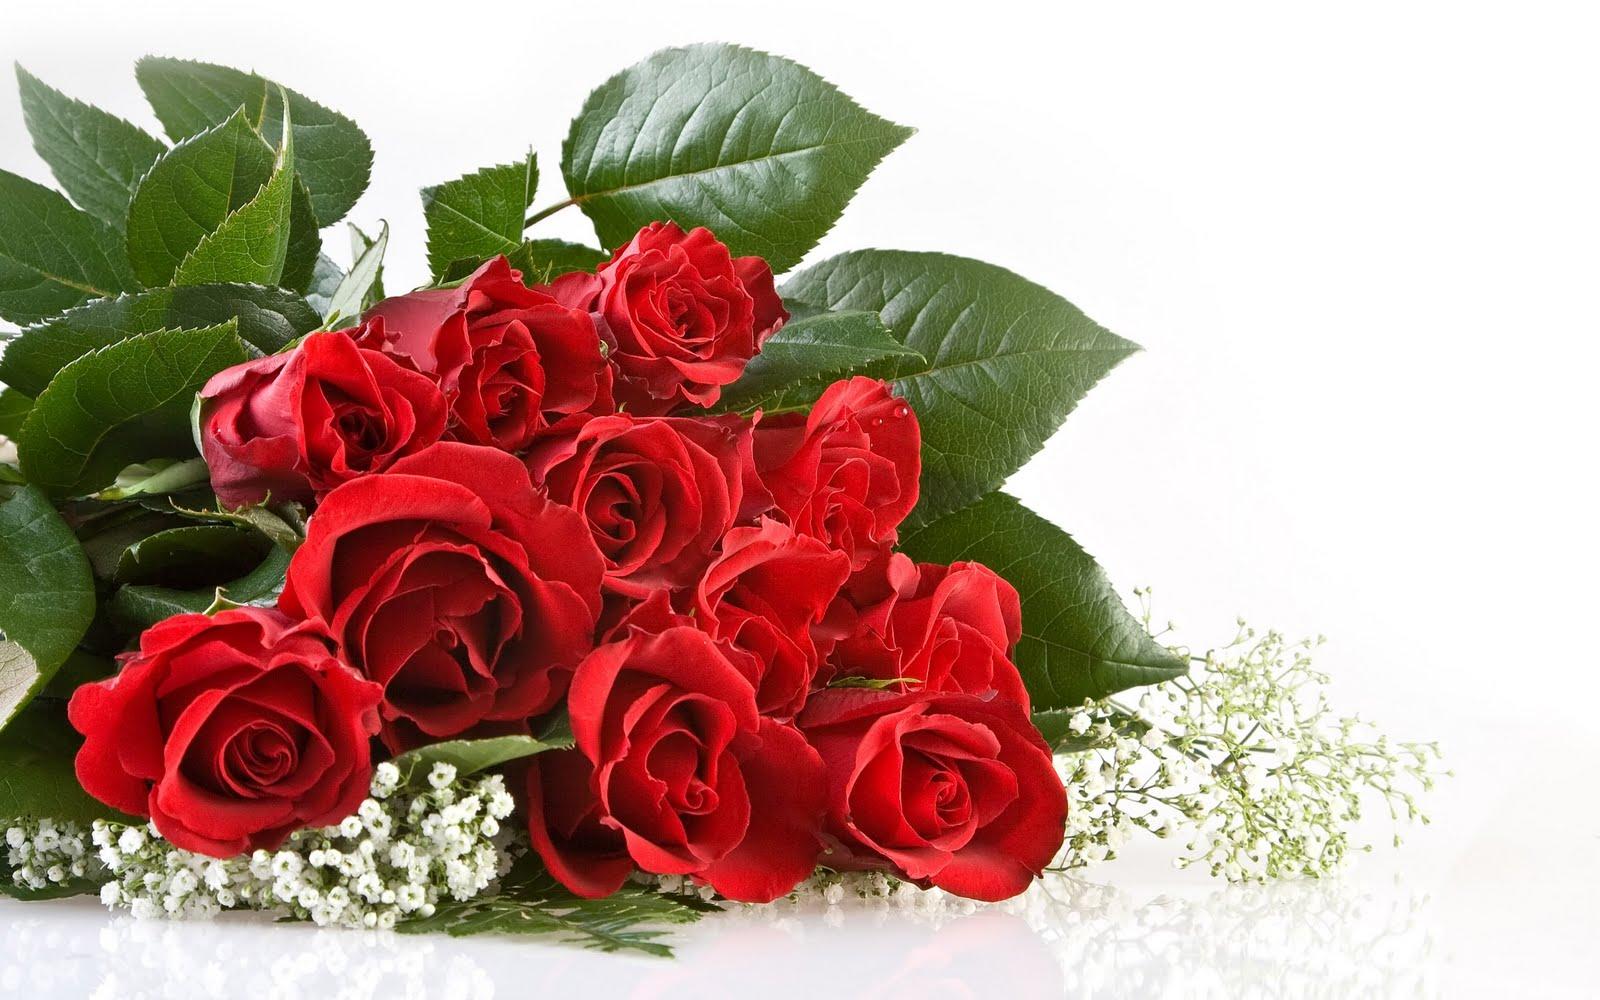 52. Gönülçelen -Inima furata - Heart Stealer - General Discussions - Comentarii - Pagina 39 Buchet_trandafiri_rosi